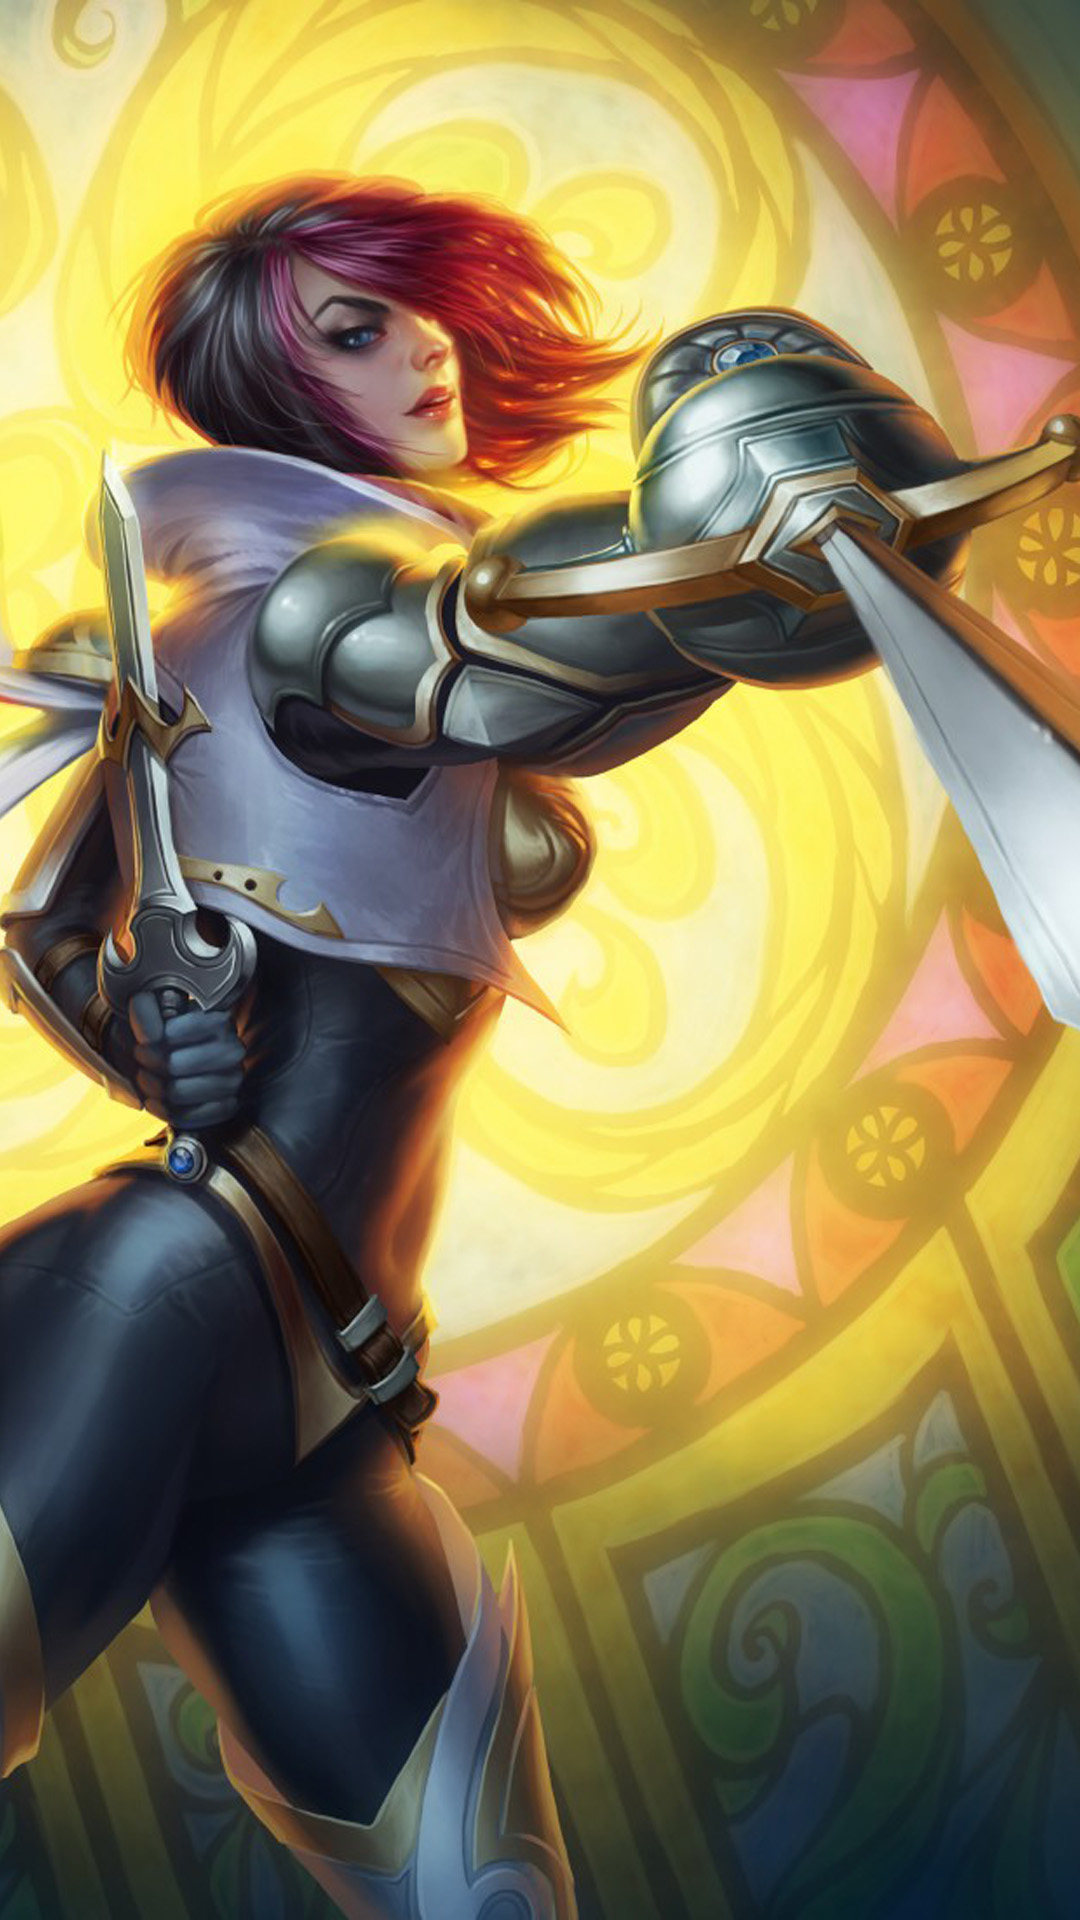 Fiora League of Legends New Free 4K Ultra HD Mobile Wallpaper